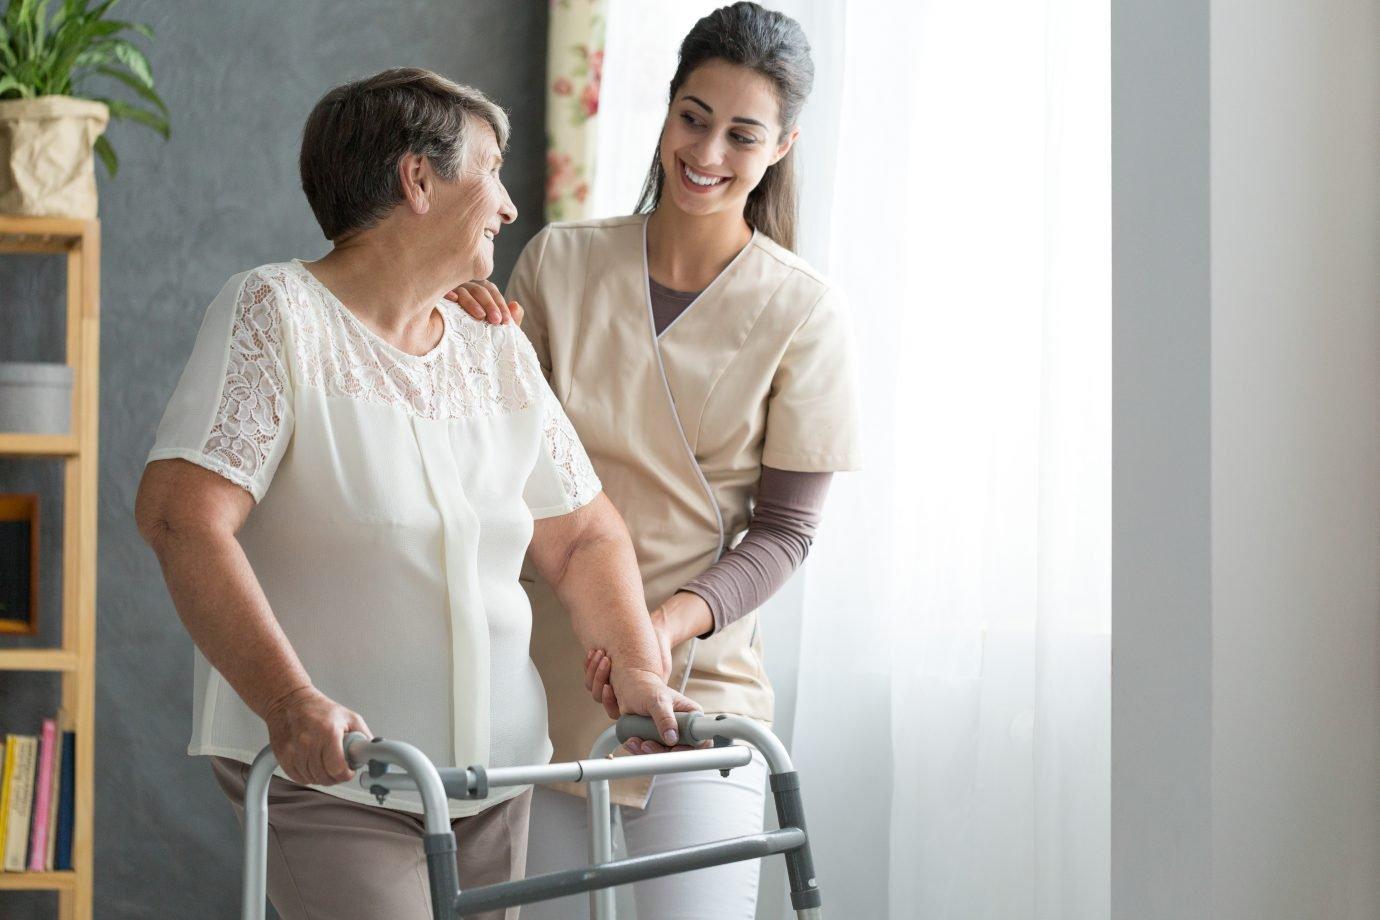 Enfermeira ajuda idosa